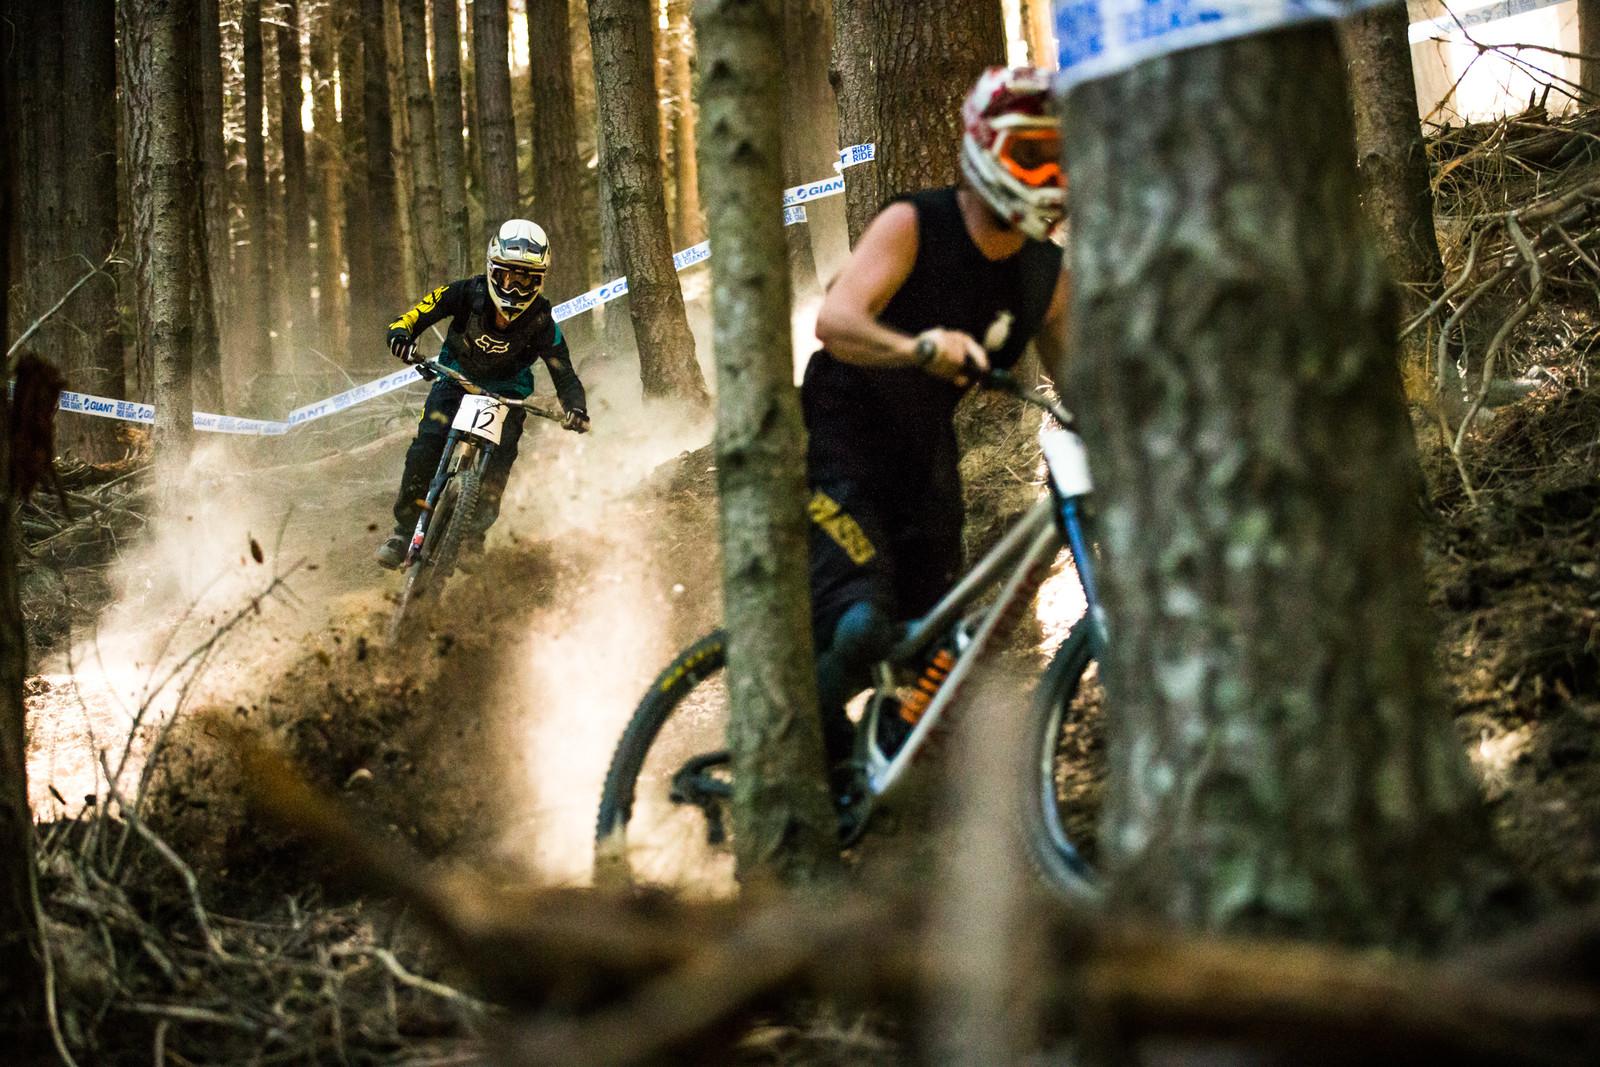 Boucherot Tanguy and Kurt McDonald - Homegrown NZ Downhill - Vertigo Bikes Ride More DH Series Race 1 - Mountain Biking Pictures - Vital MTB